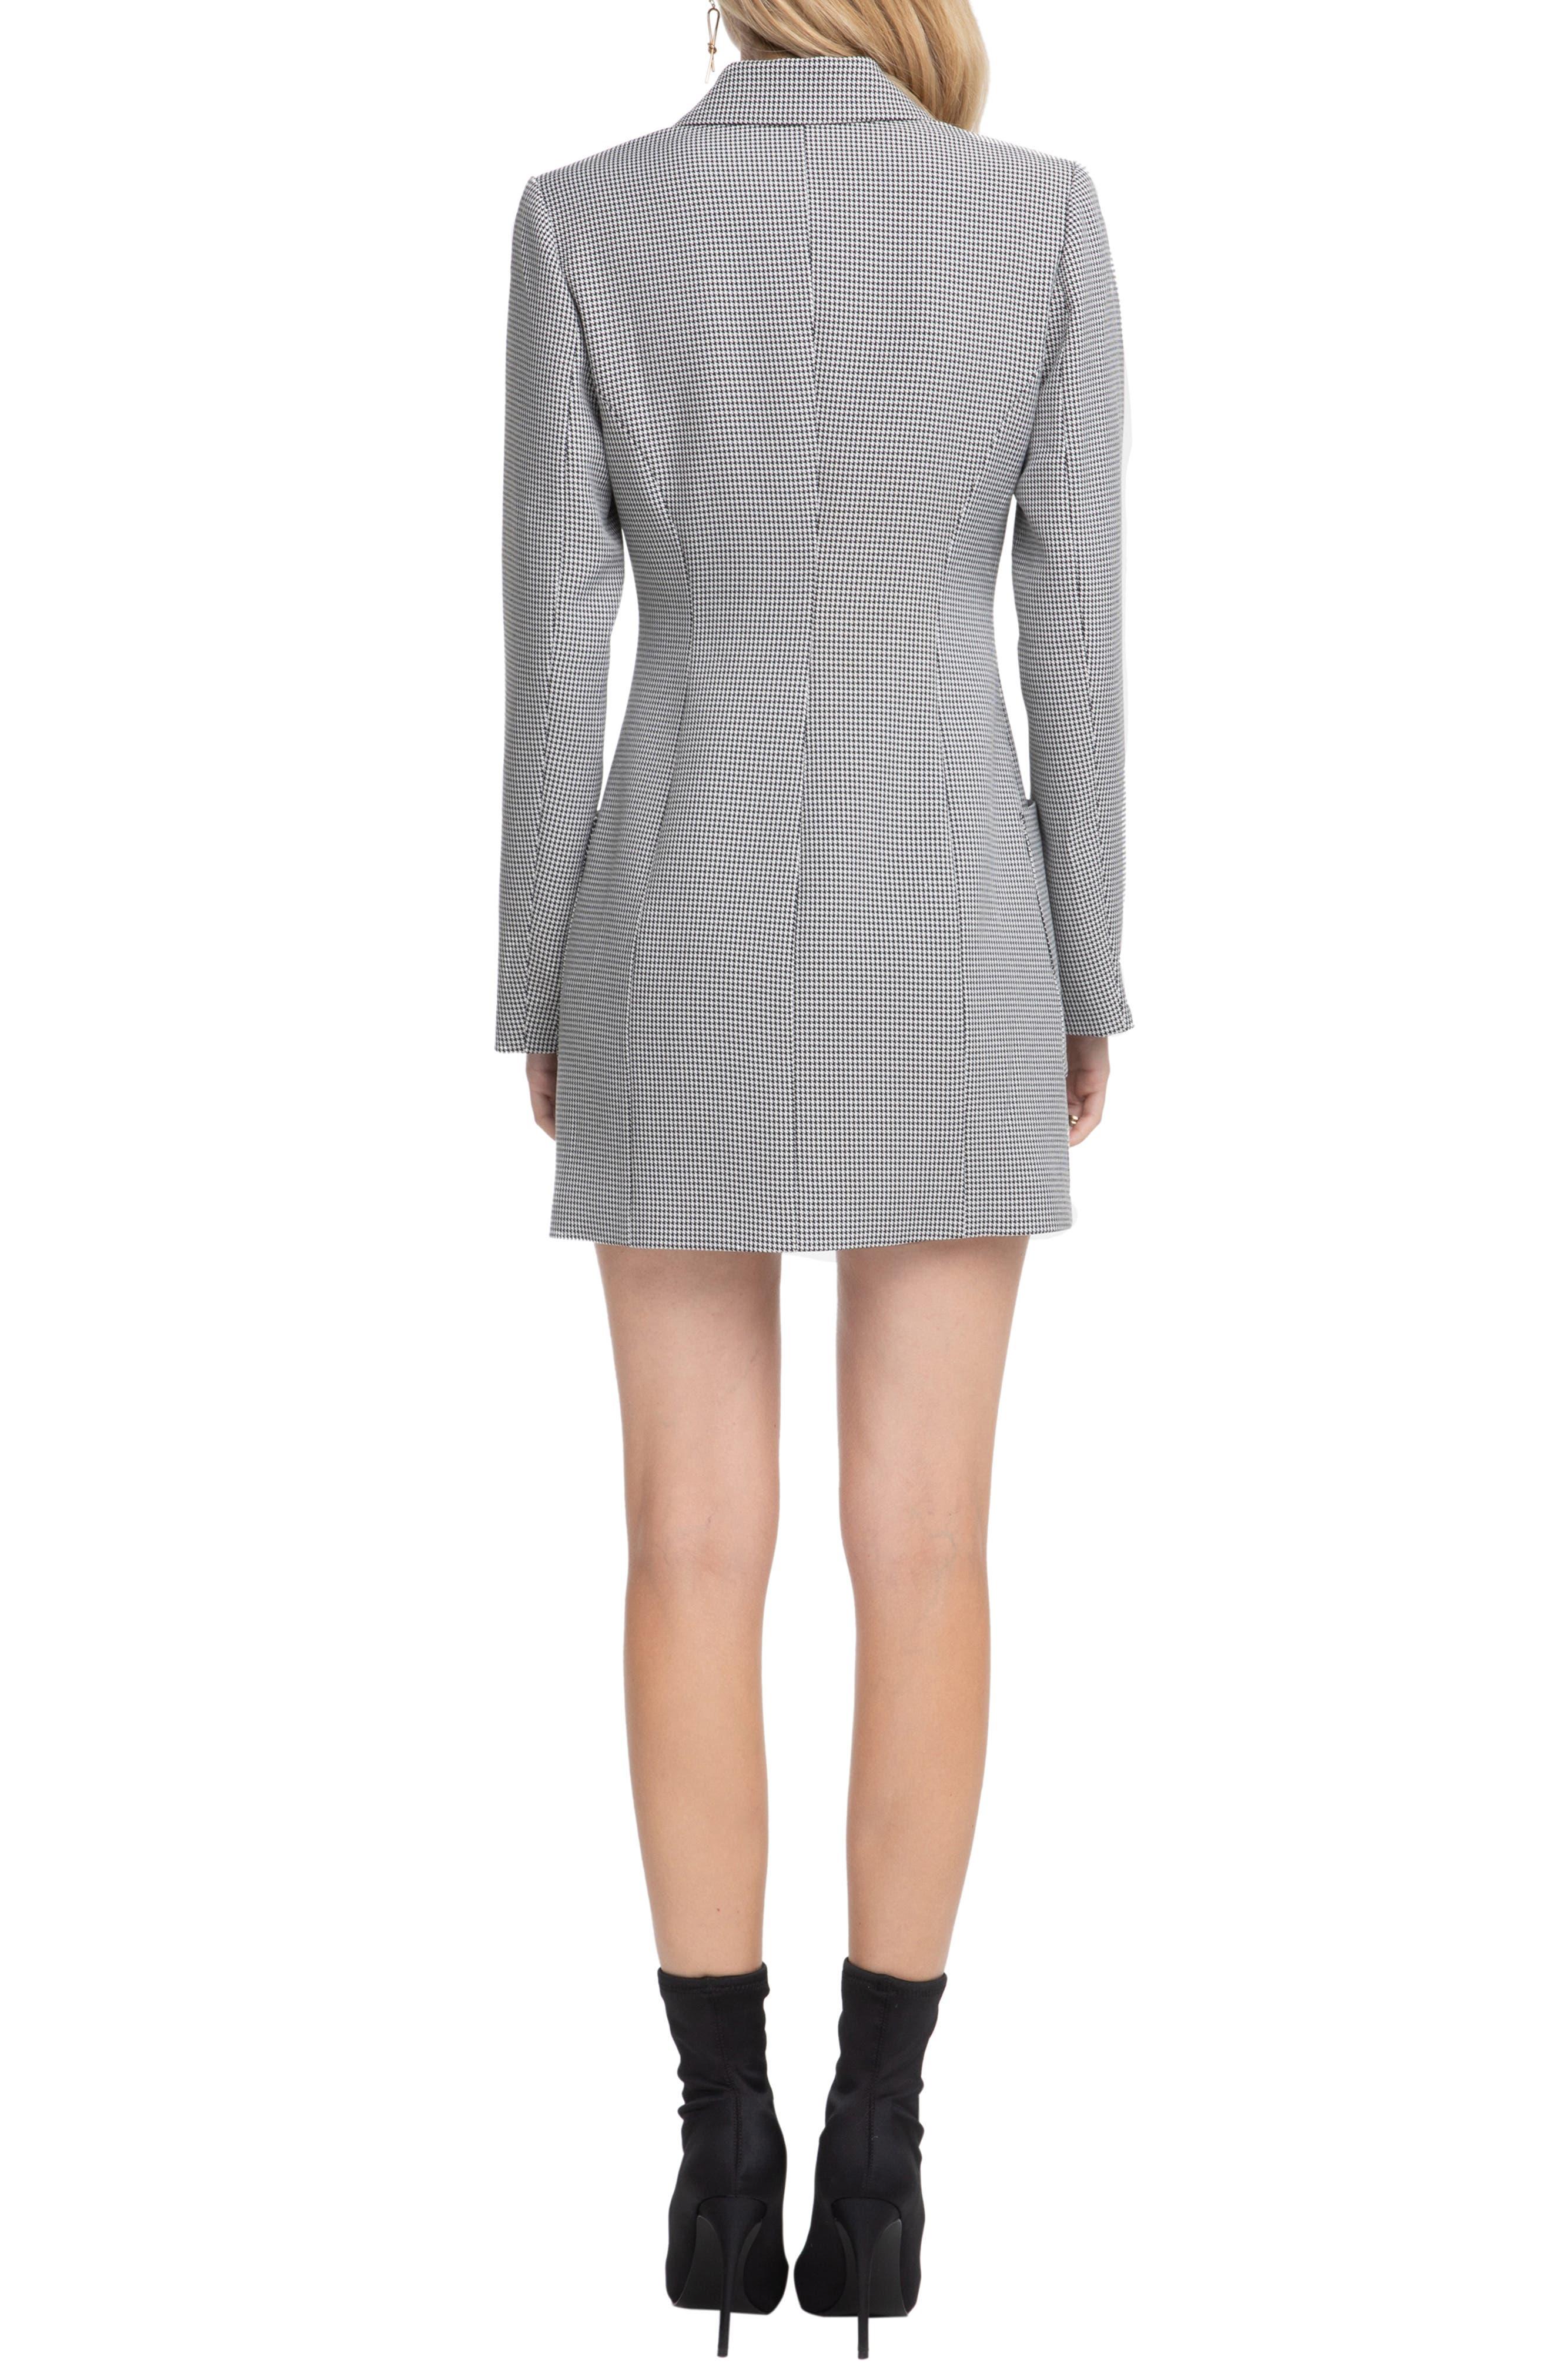 ASTR THE LABEL,                             Houndstooth Blazer Dress,                             Alternate thumbnail 2, color,                             BLACK/ WHITE